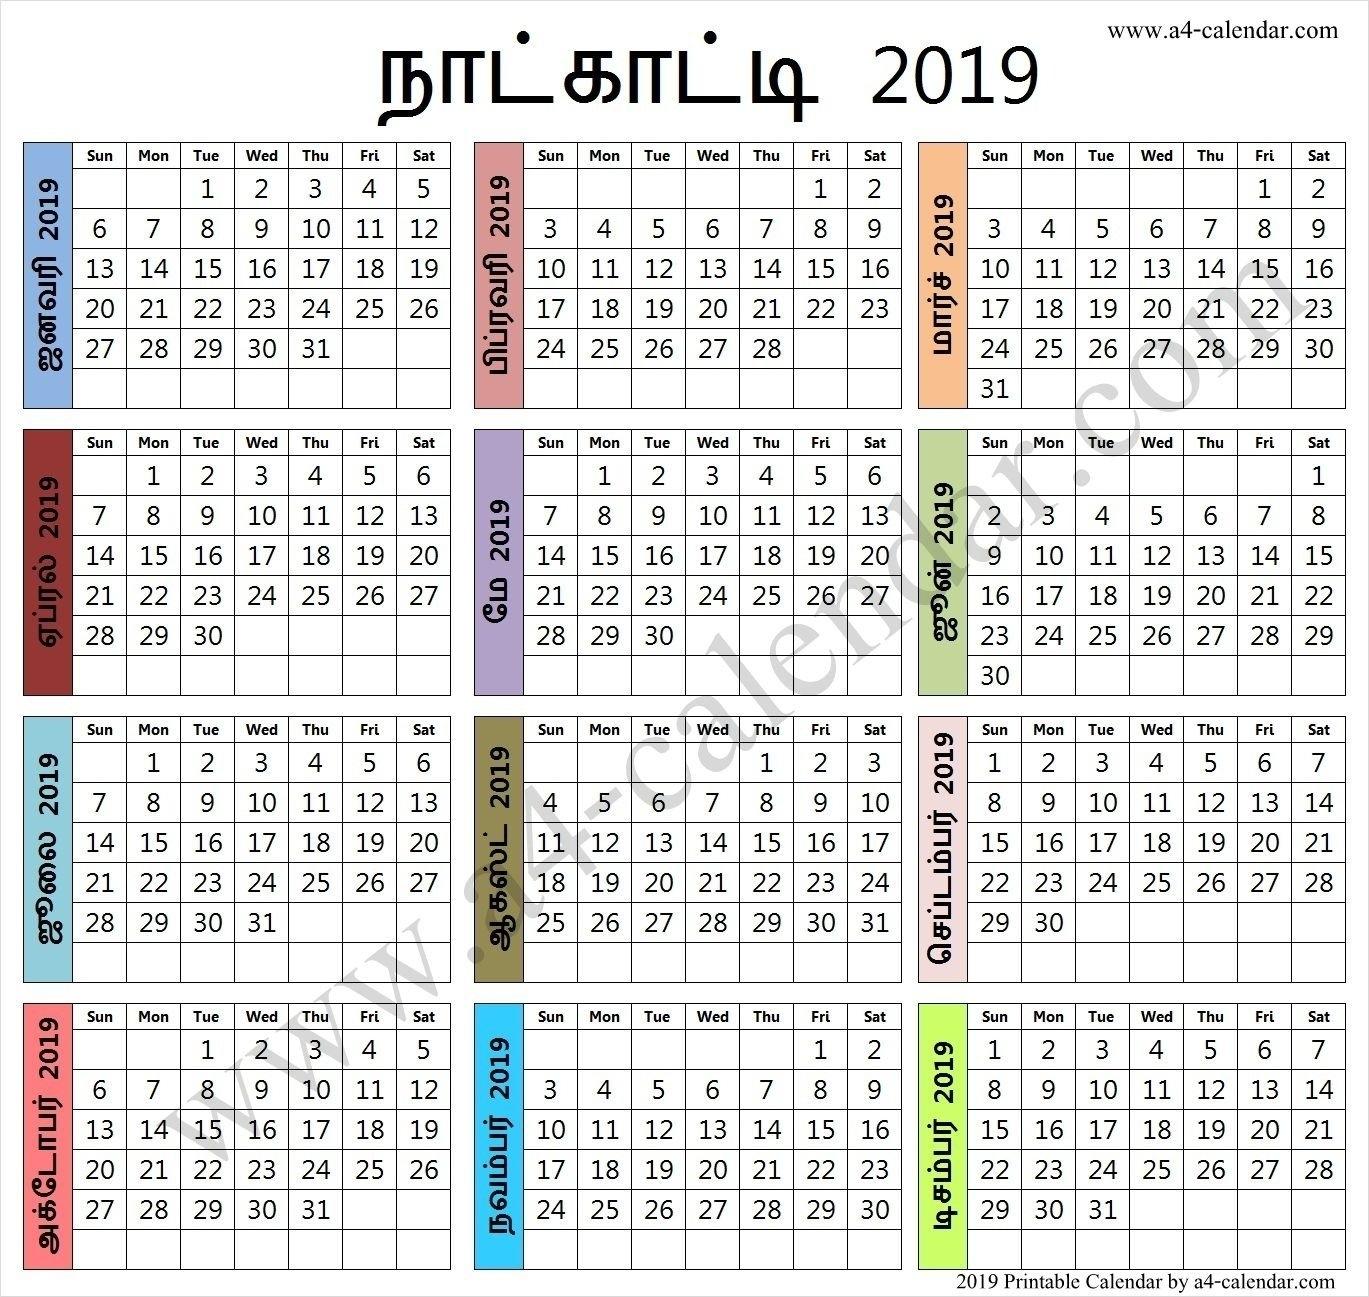 Next Year Calendar In Tamil | Ten Free Printable Calendar 2020-2021 within Yrdsb Calendar 2019 2021